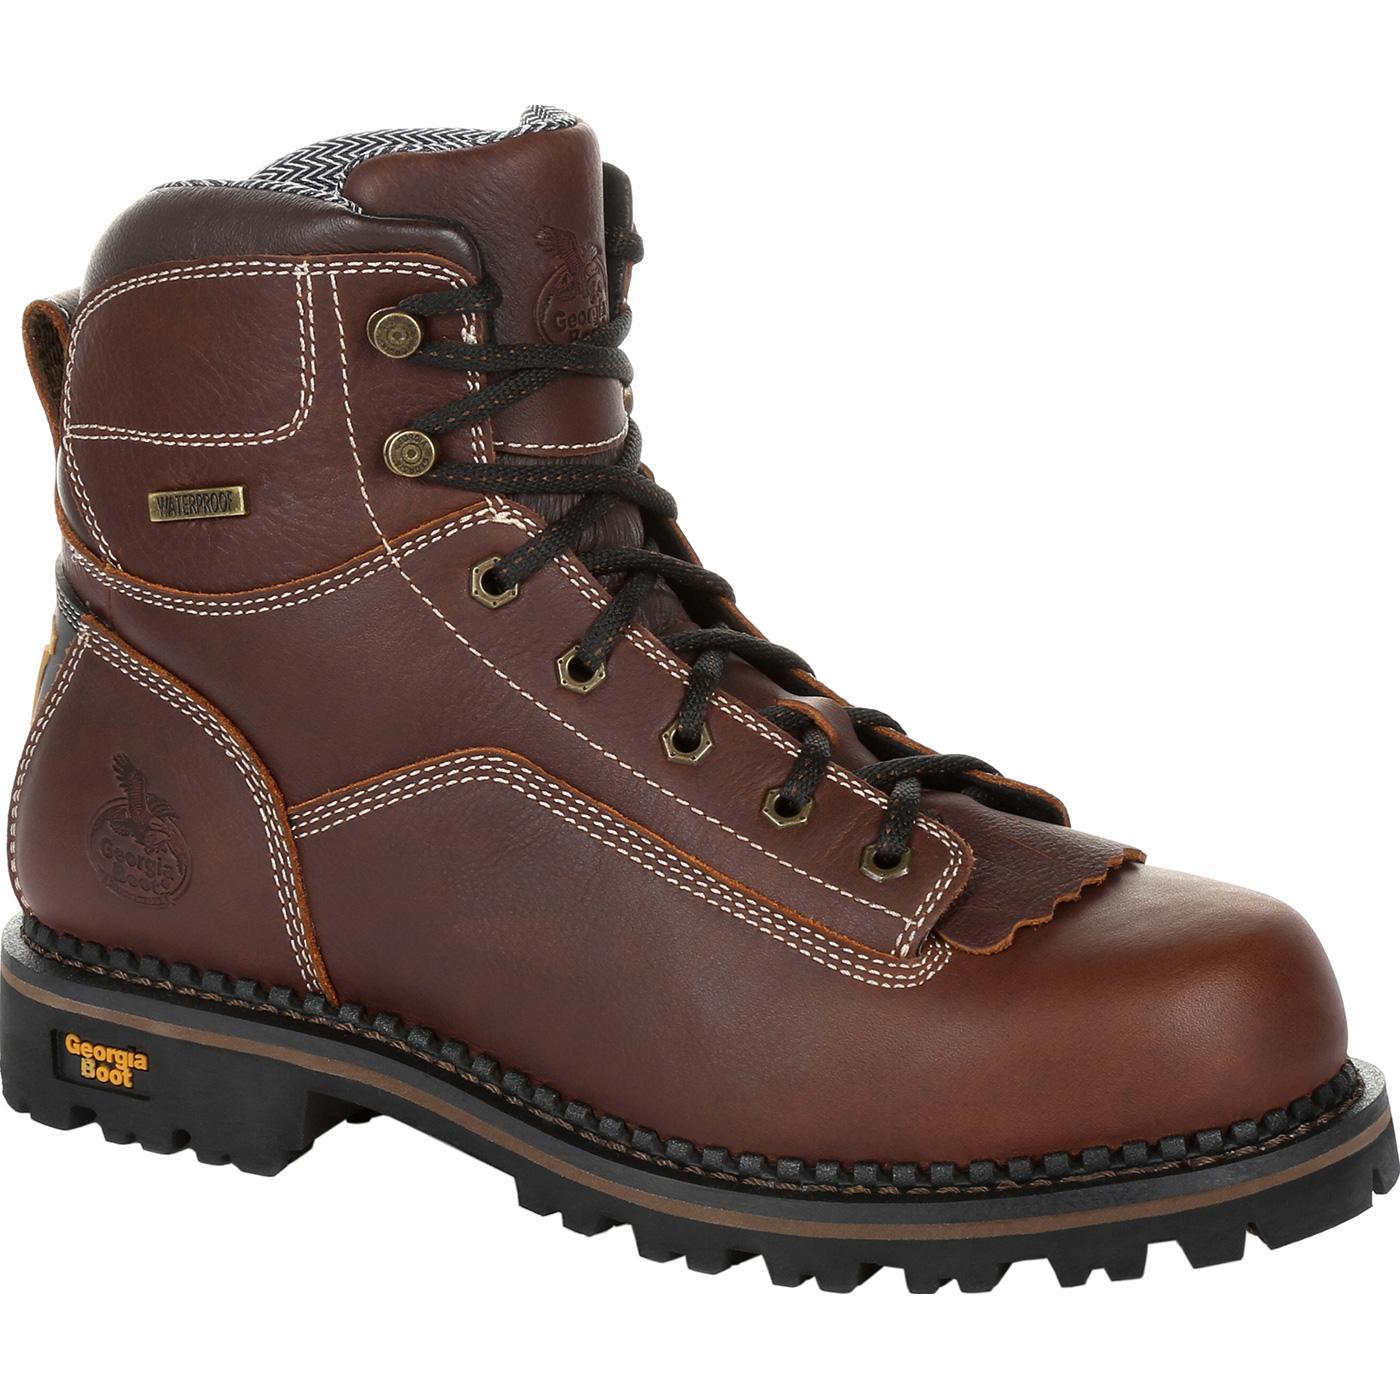 a3a9081dc45 Georgia Boot AMP LT Logger Low Heel Waterproof Work Boot